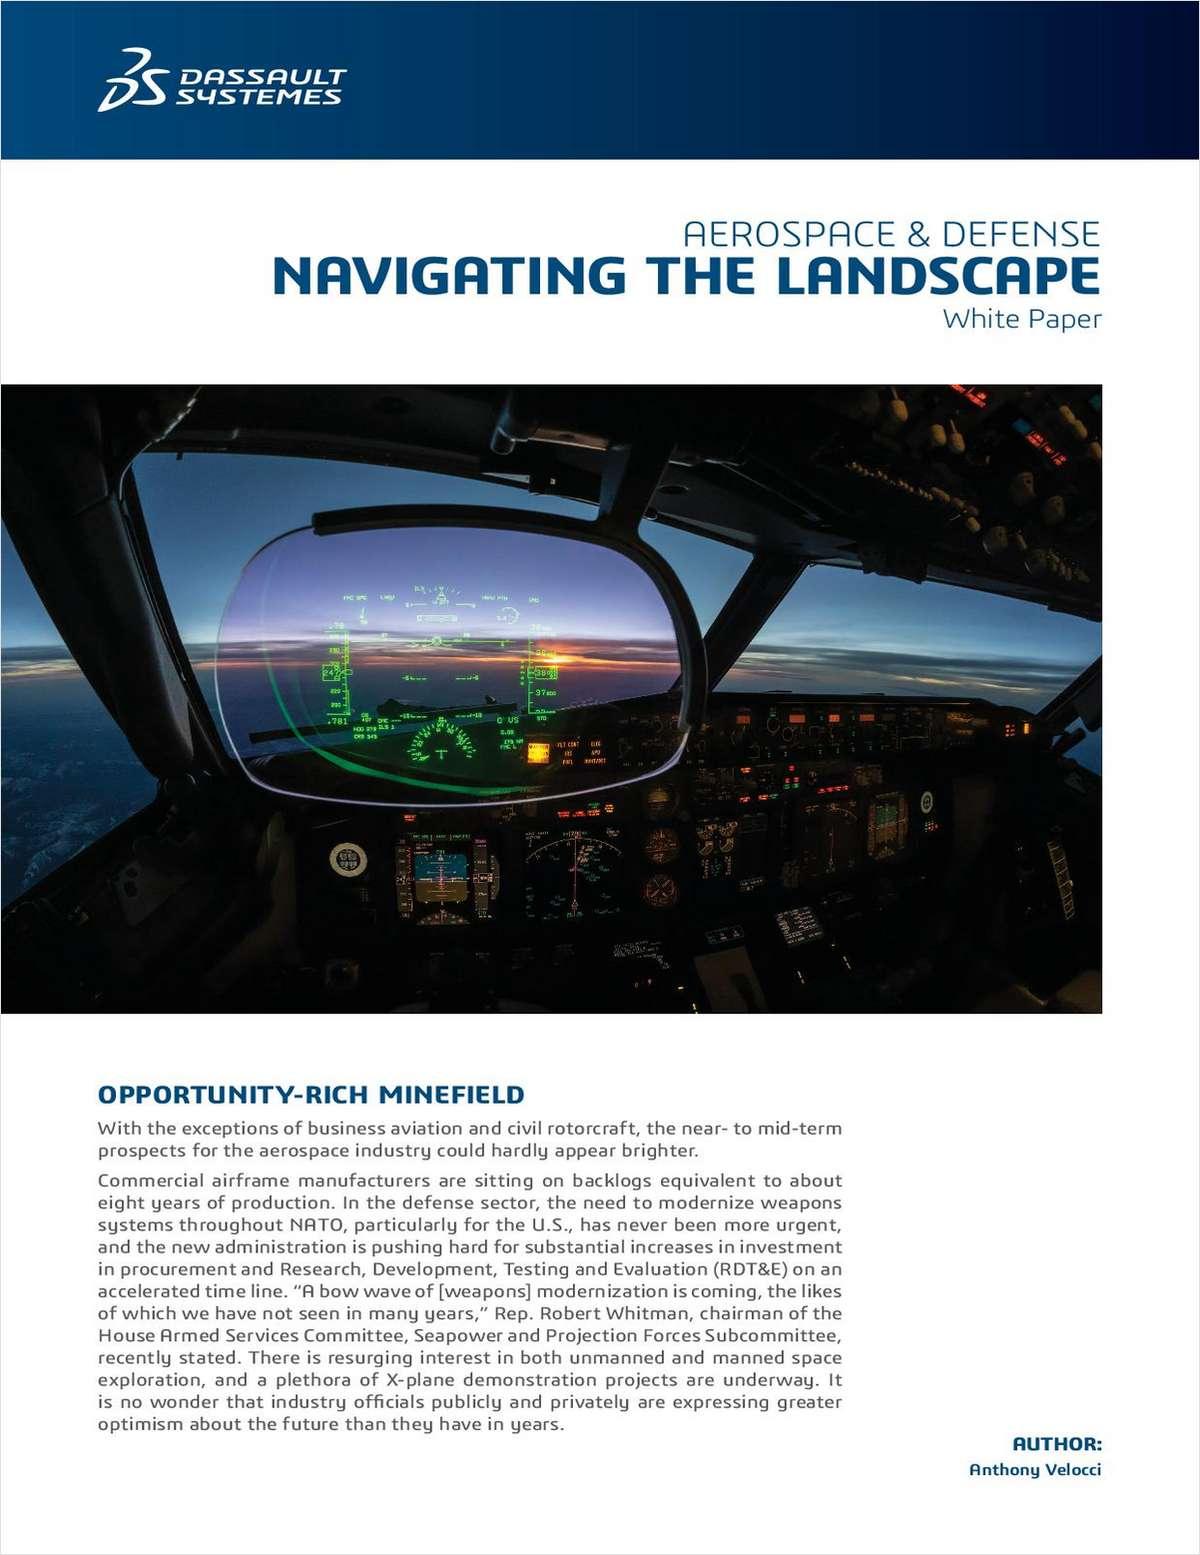 Aerospace & Defense White Paper: Navigating the Landscape